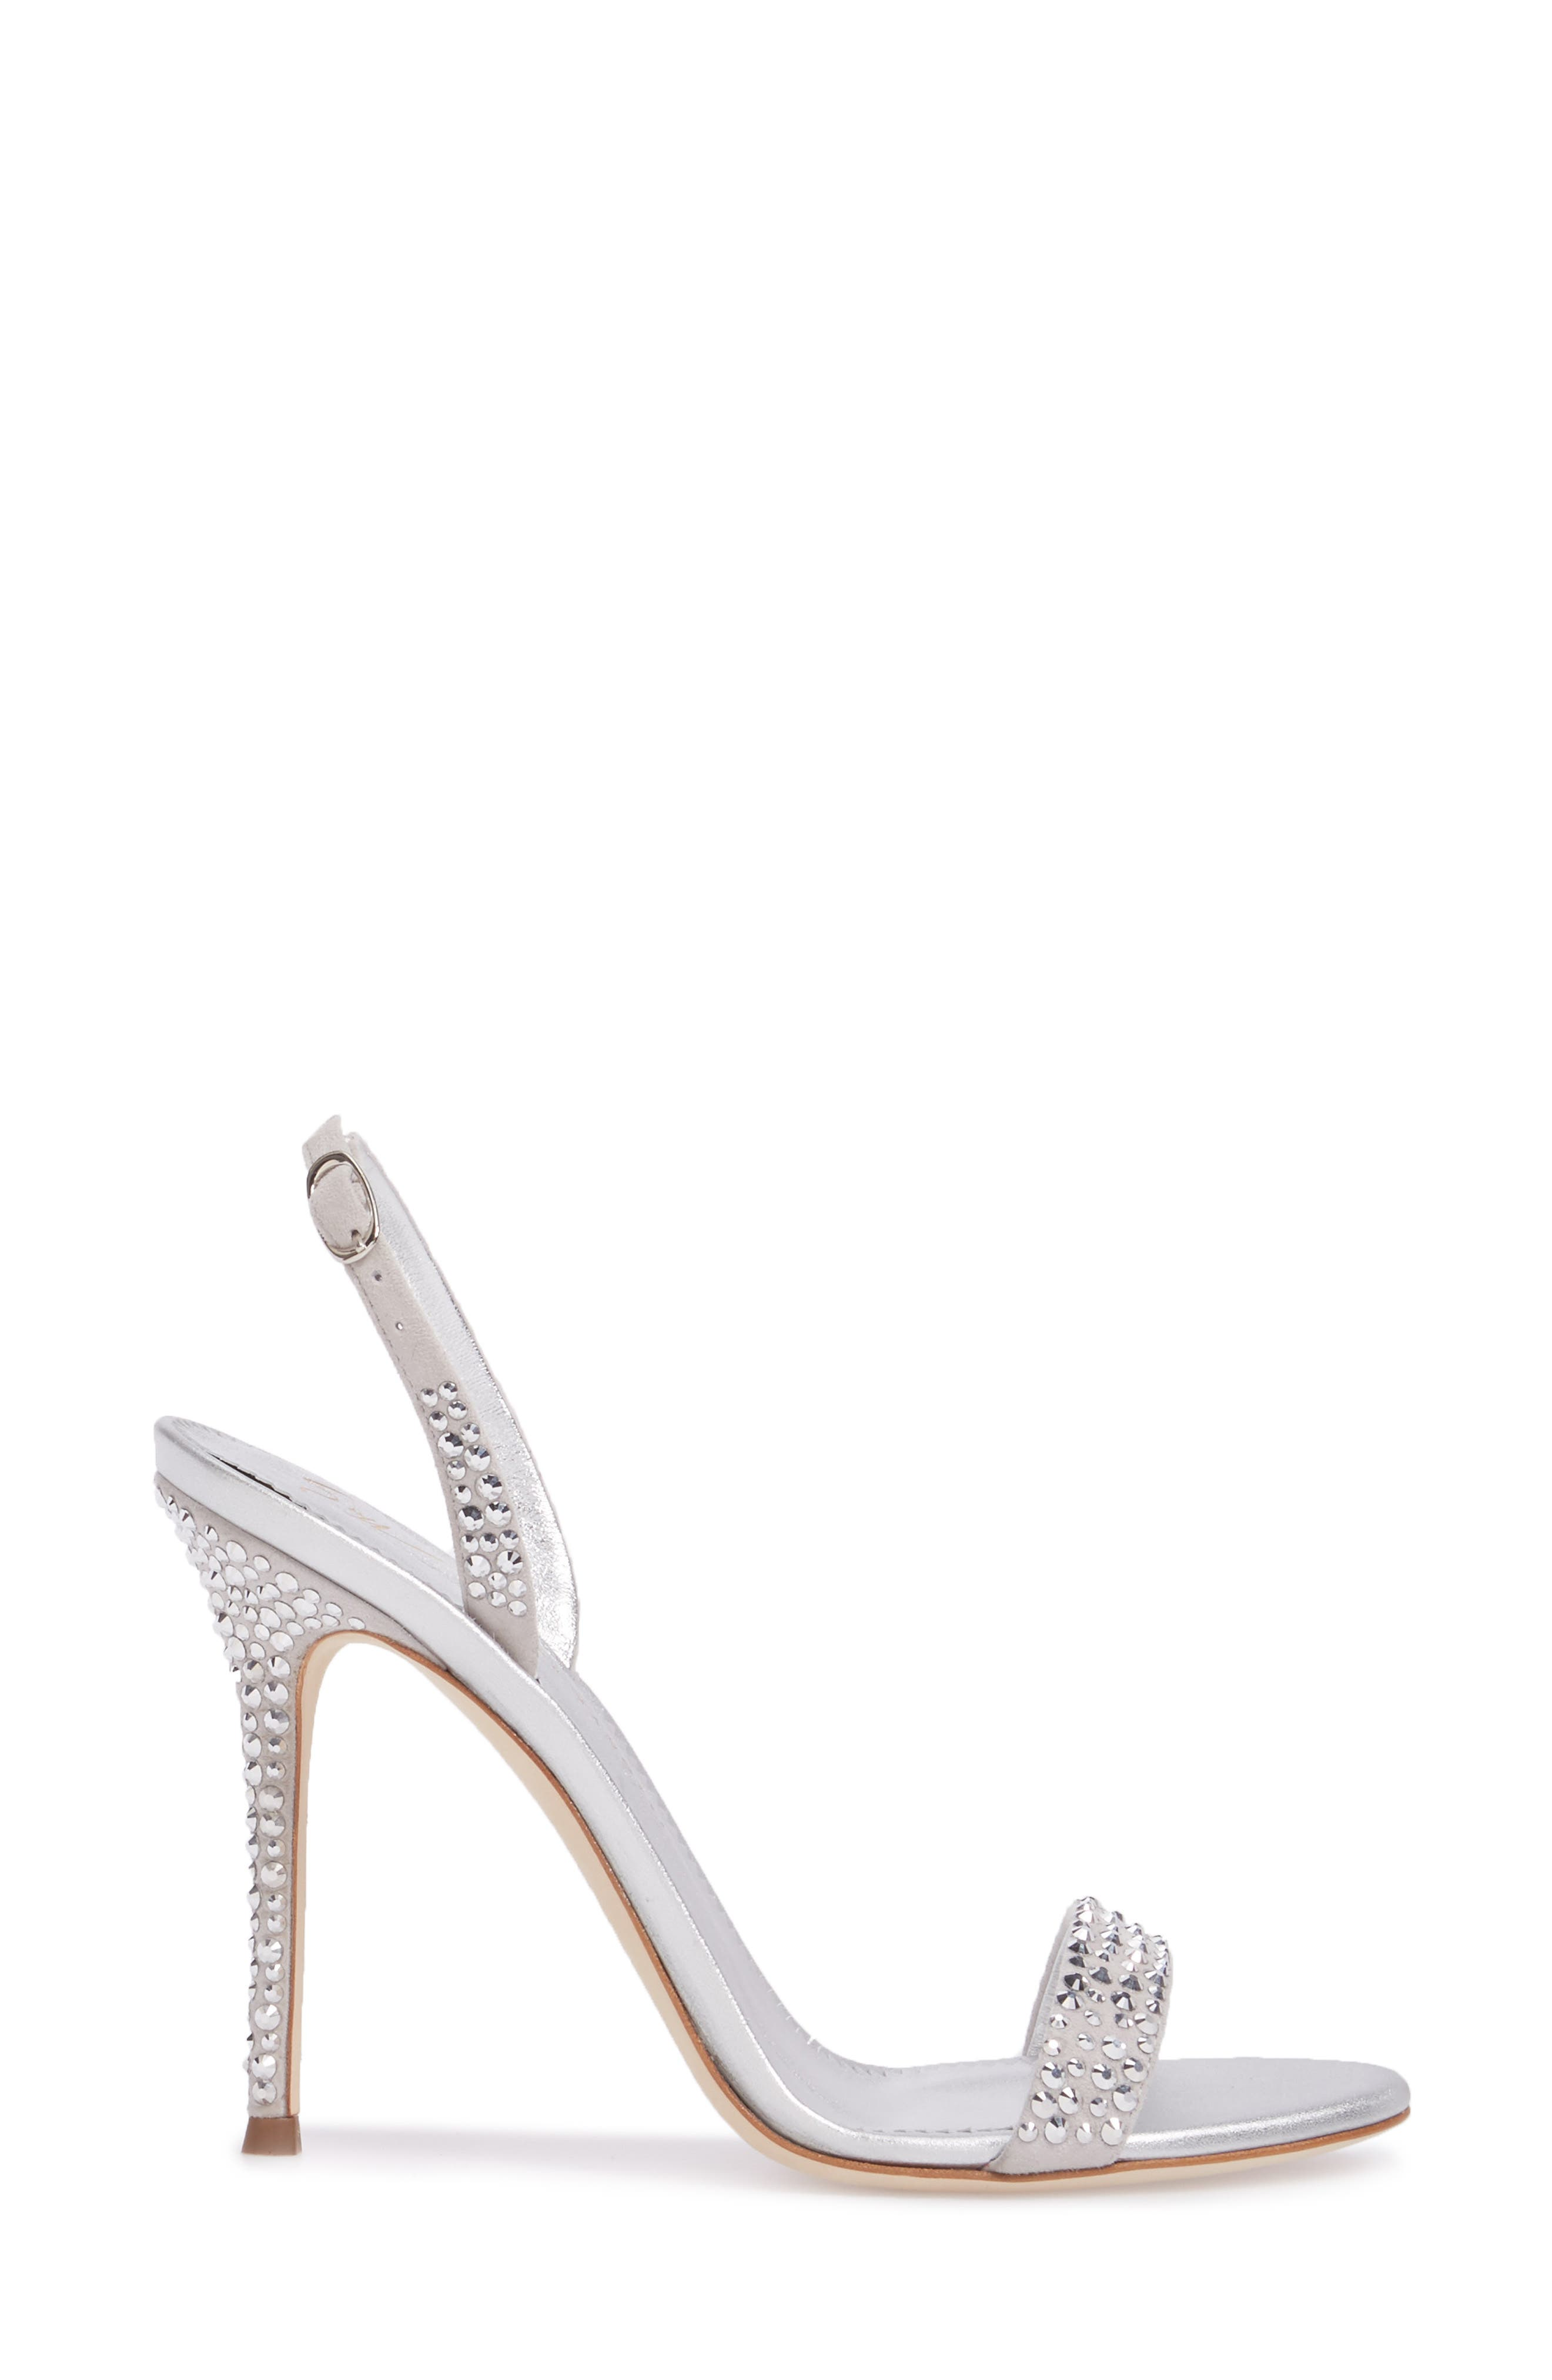 Musitco Crystal Embellished Slingback Sandal,                             Alternate thumbnail 3, color,                             054